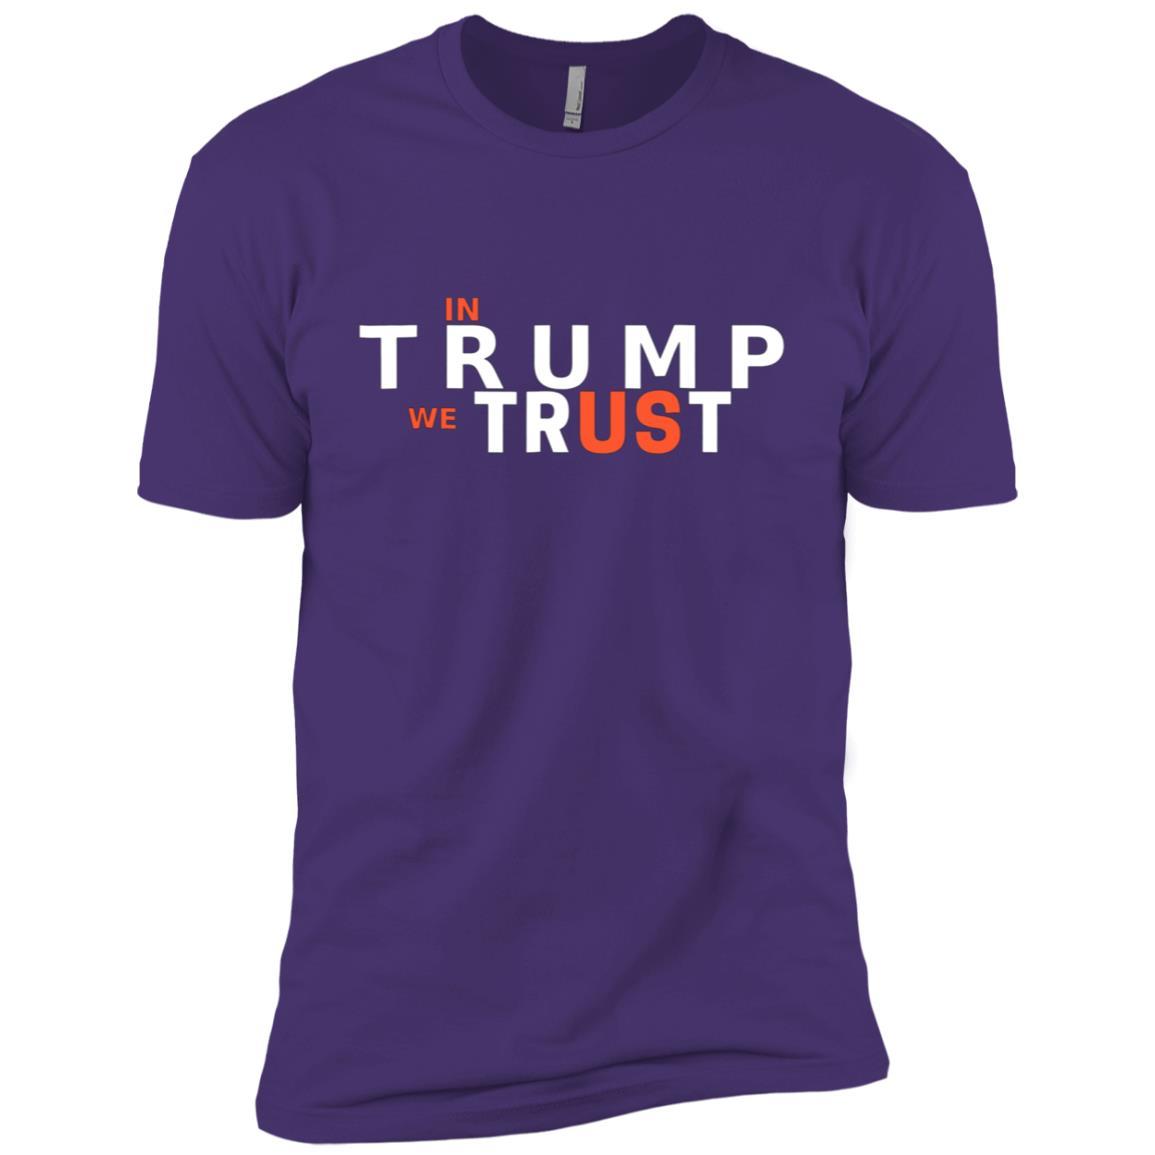 In Trump We Trust – 2020 Elections Men Short Sleeve T-Shirt